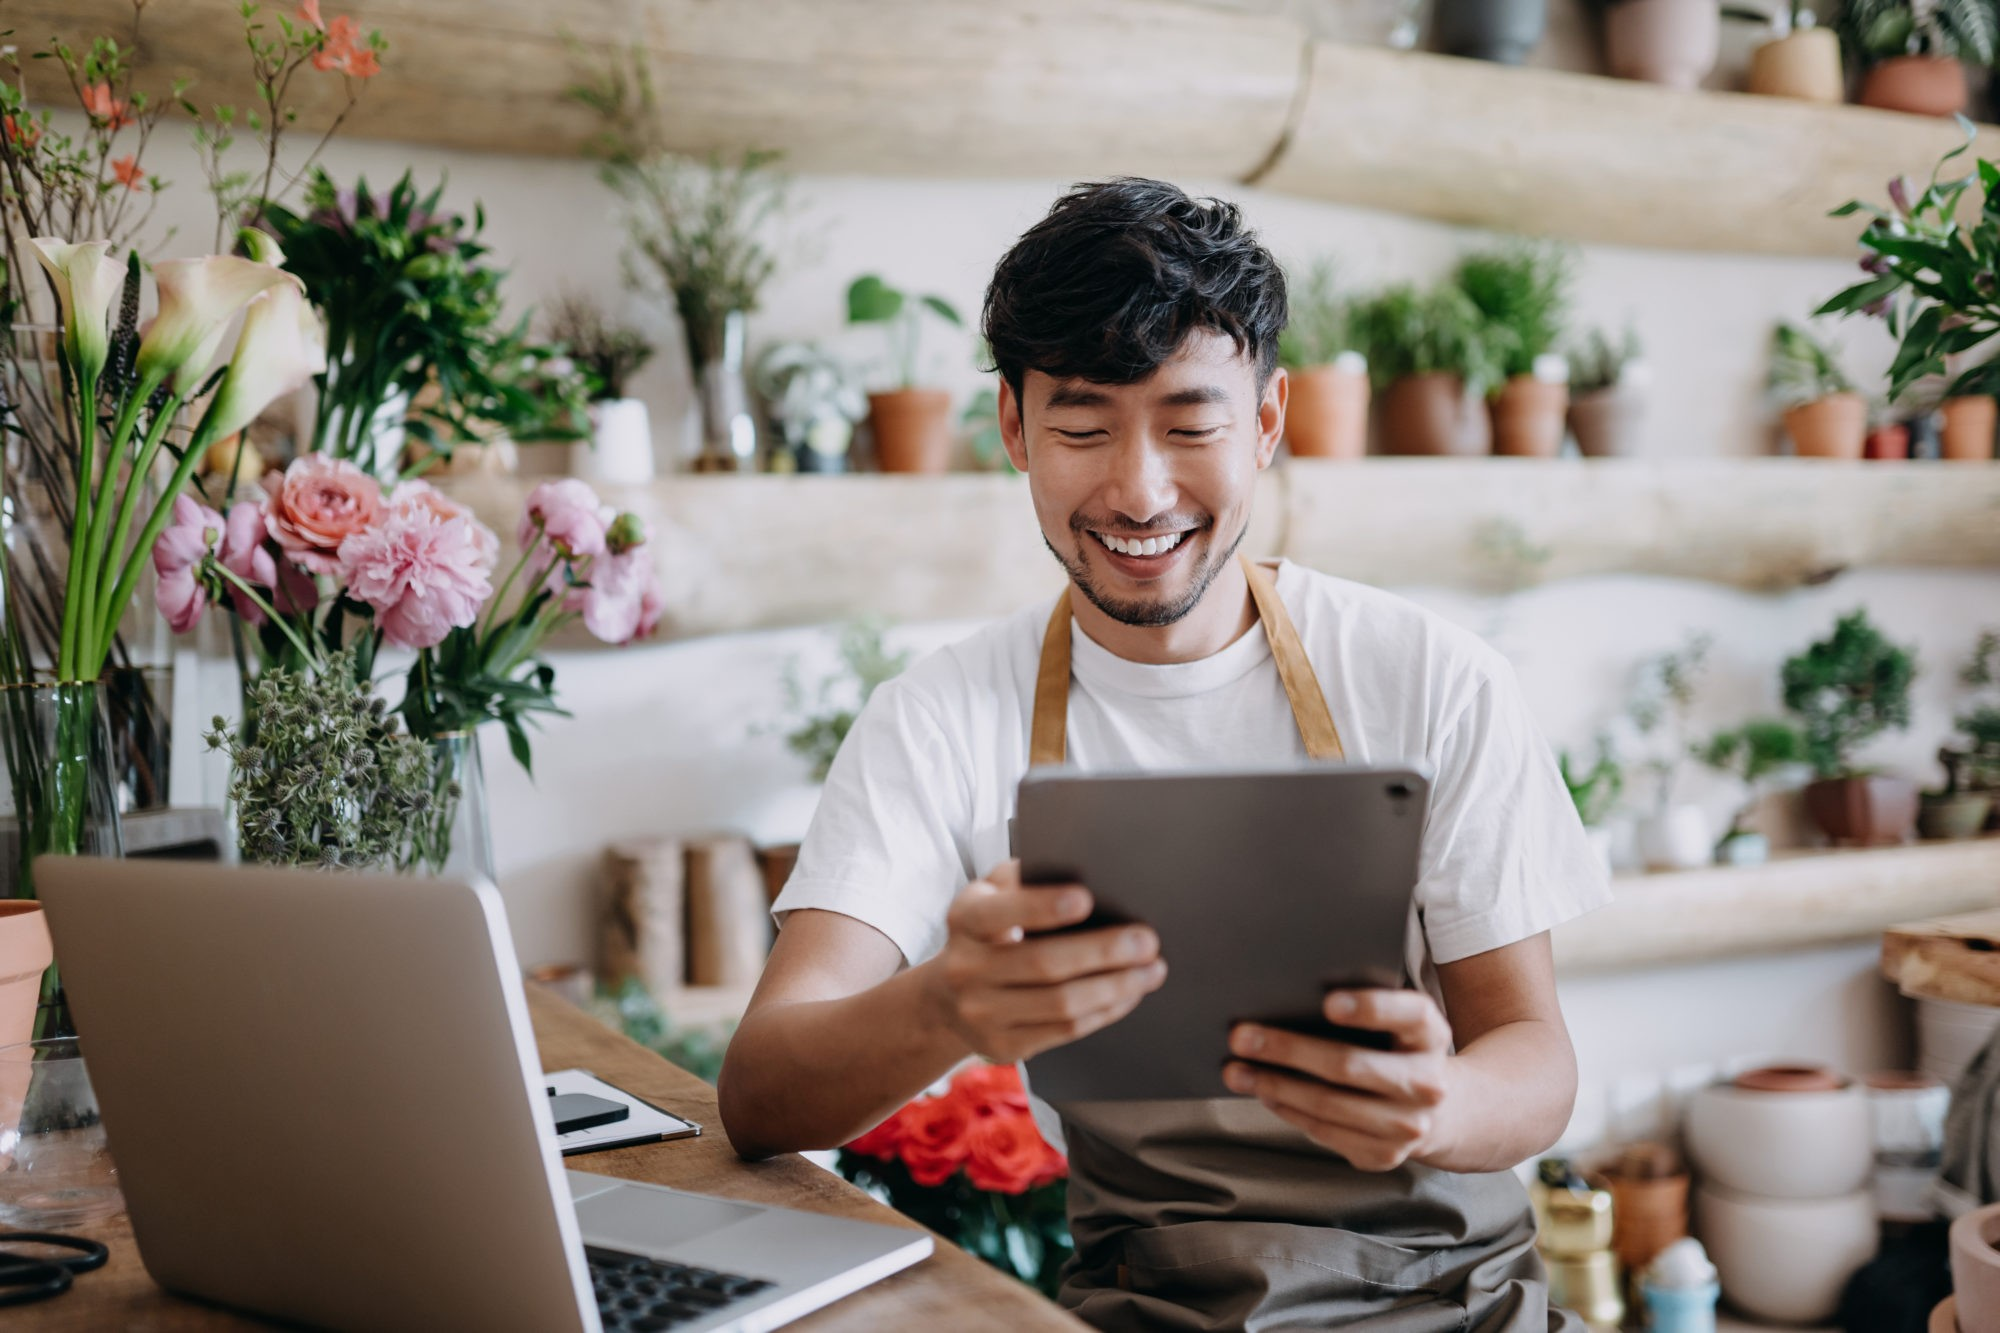 Como iniciar tu pequeño negocio o emprendimiento